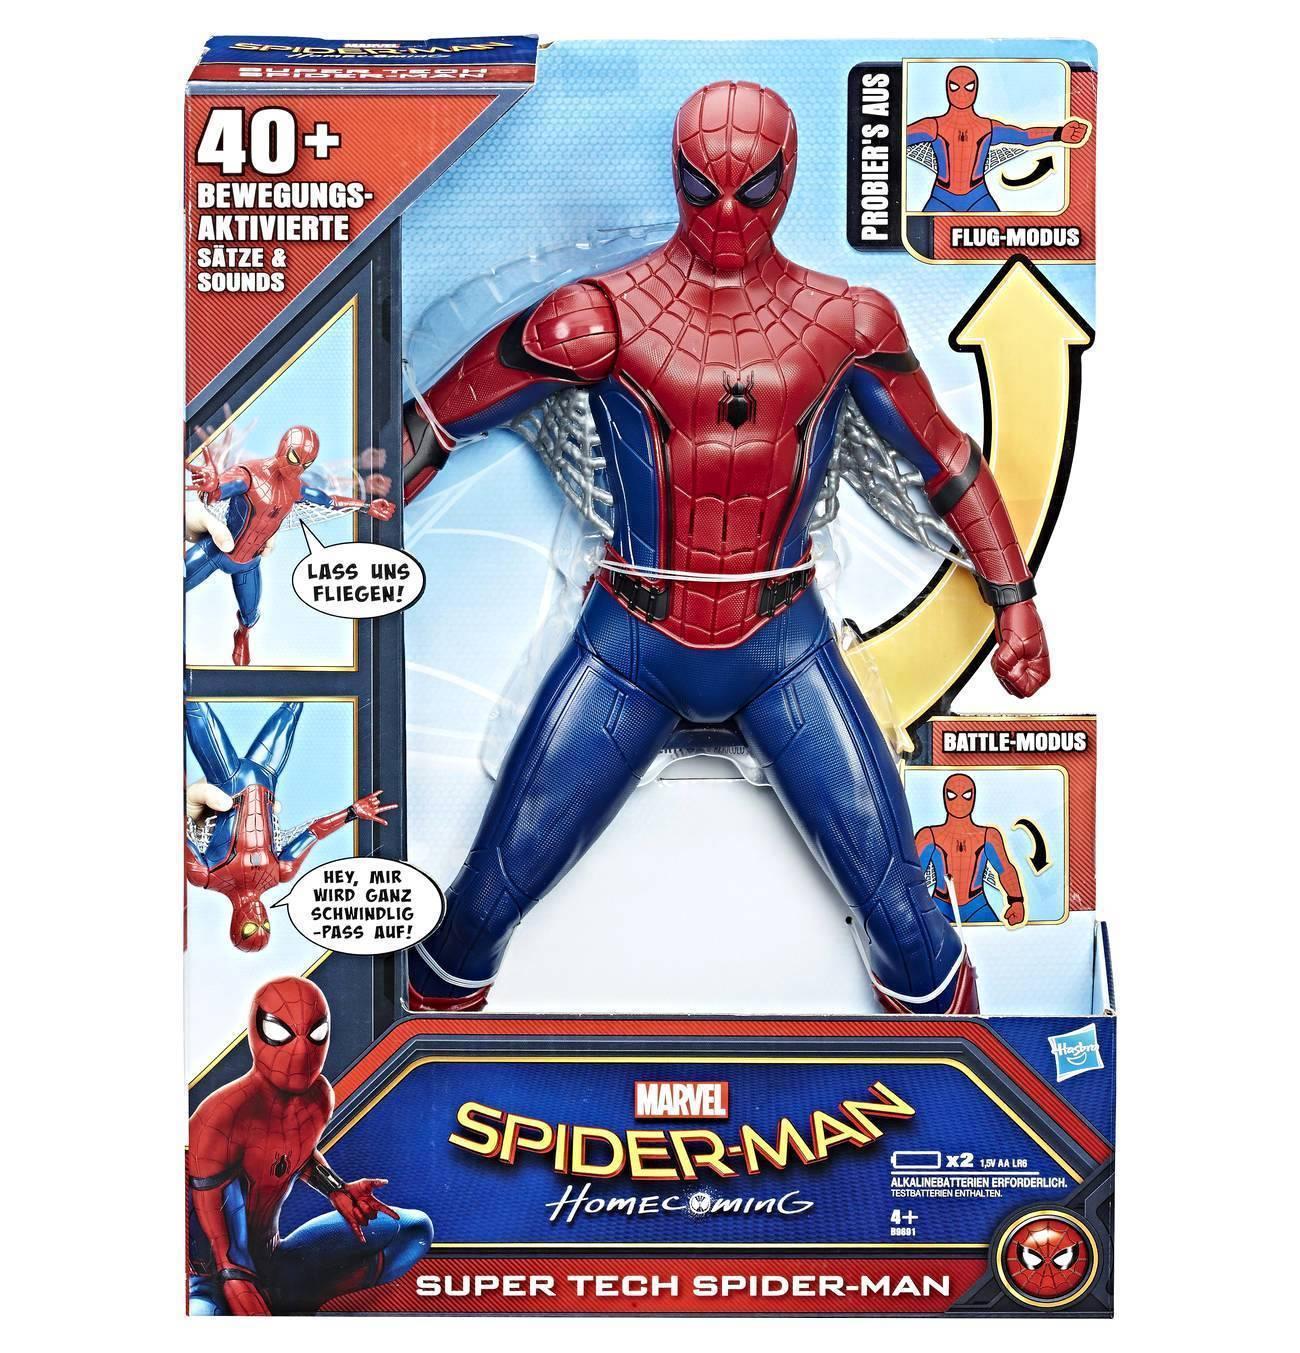 SPIDERMAN SUPER TECH B9691